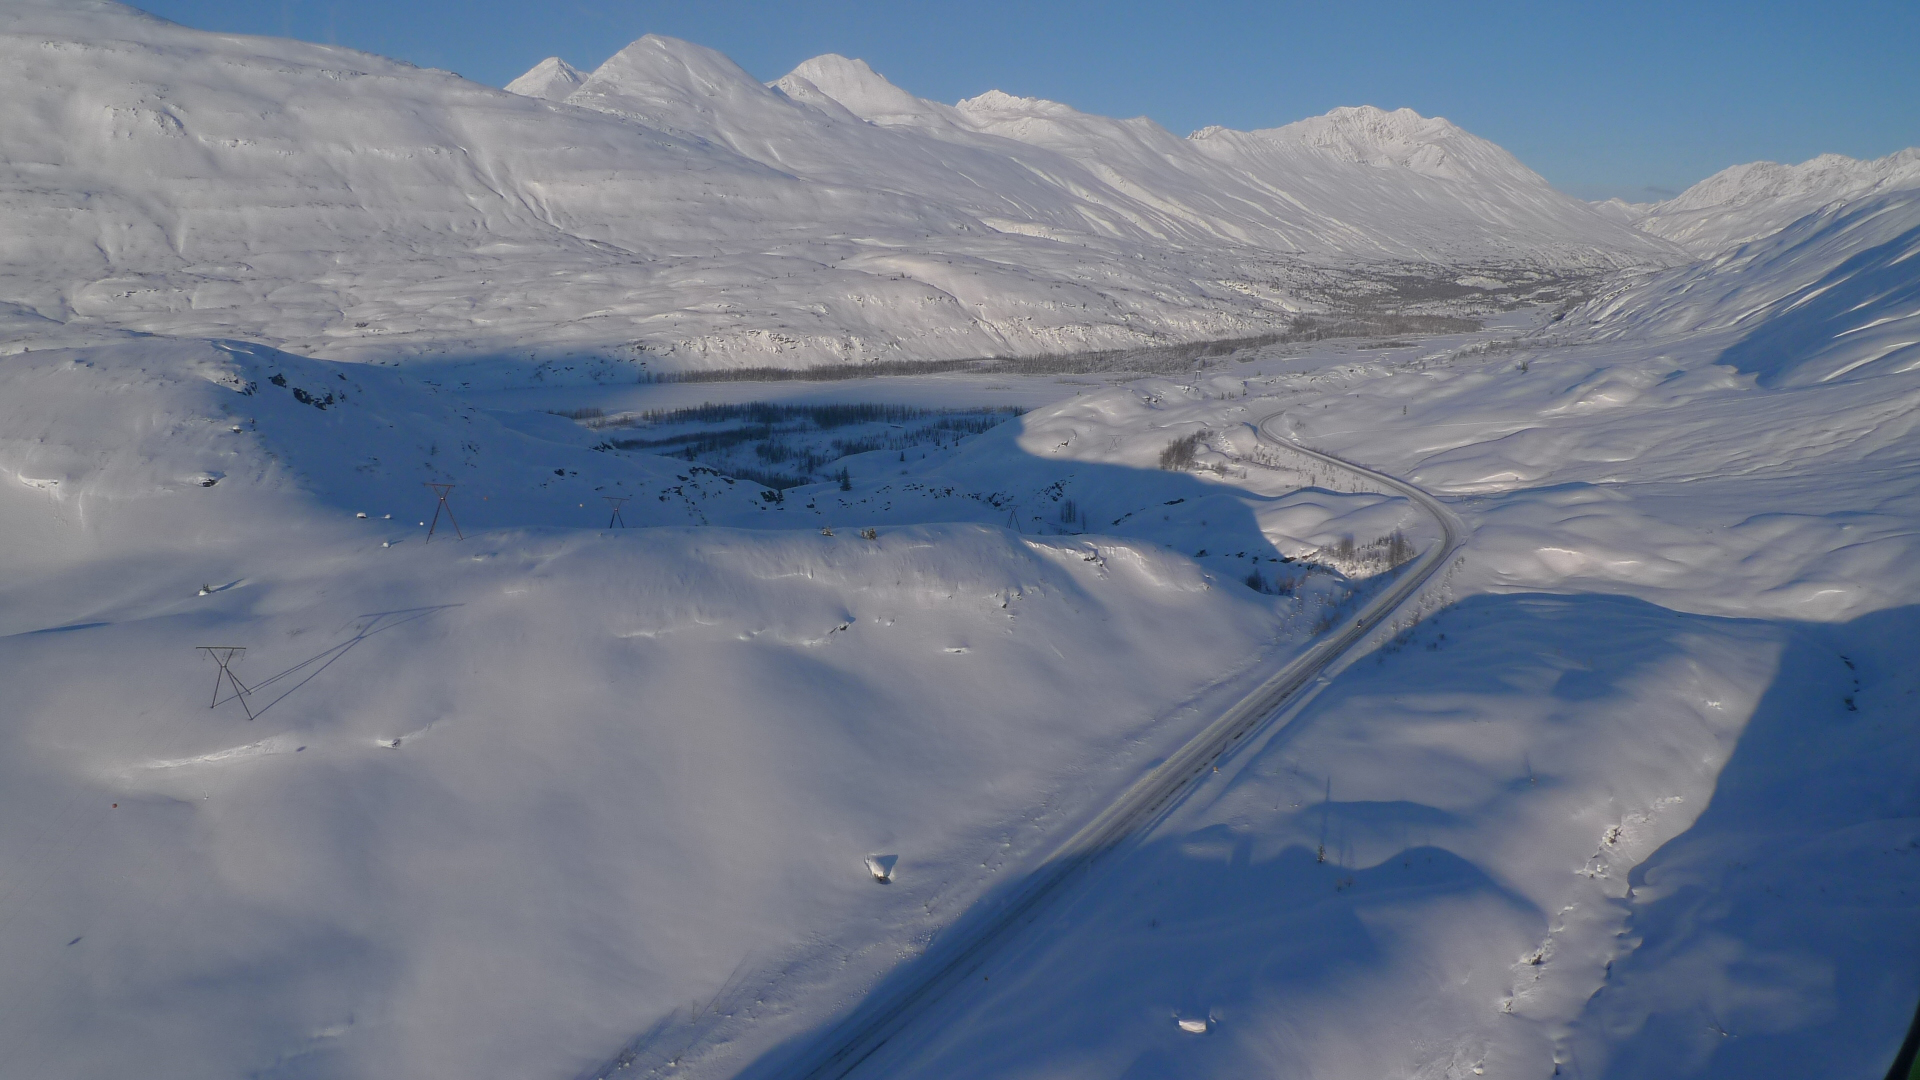 Thompson Pass Valdez Alaska Teton Gravity Research Films The Dream Factory